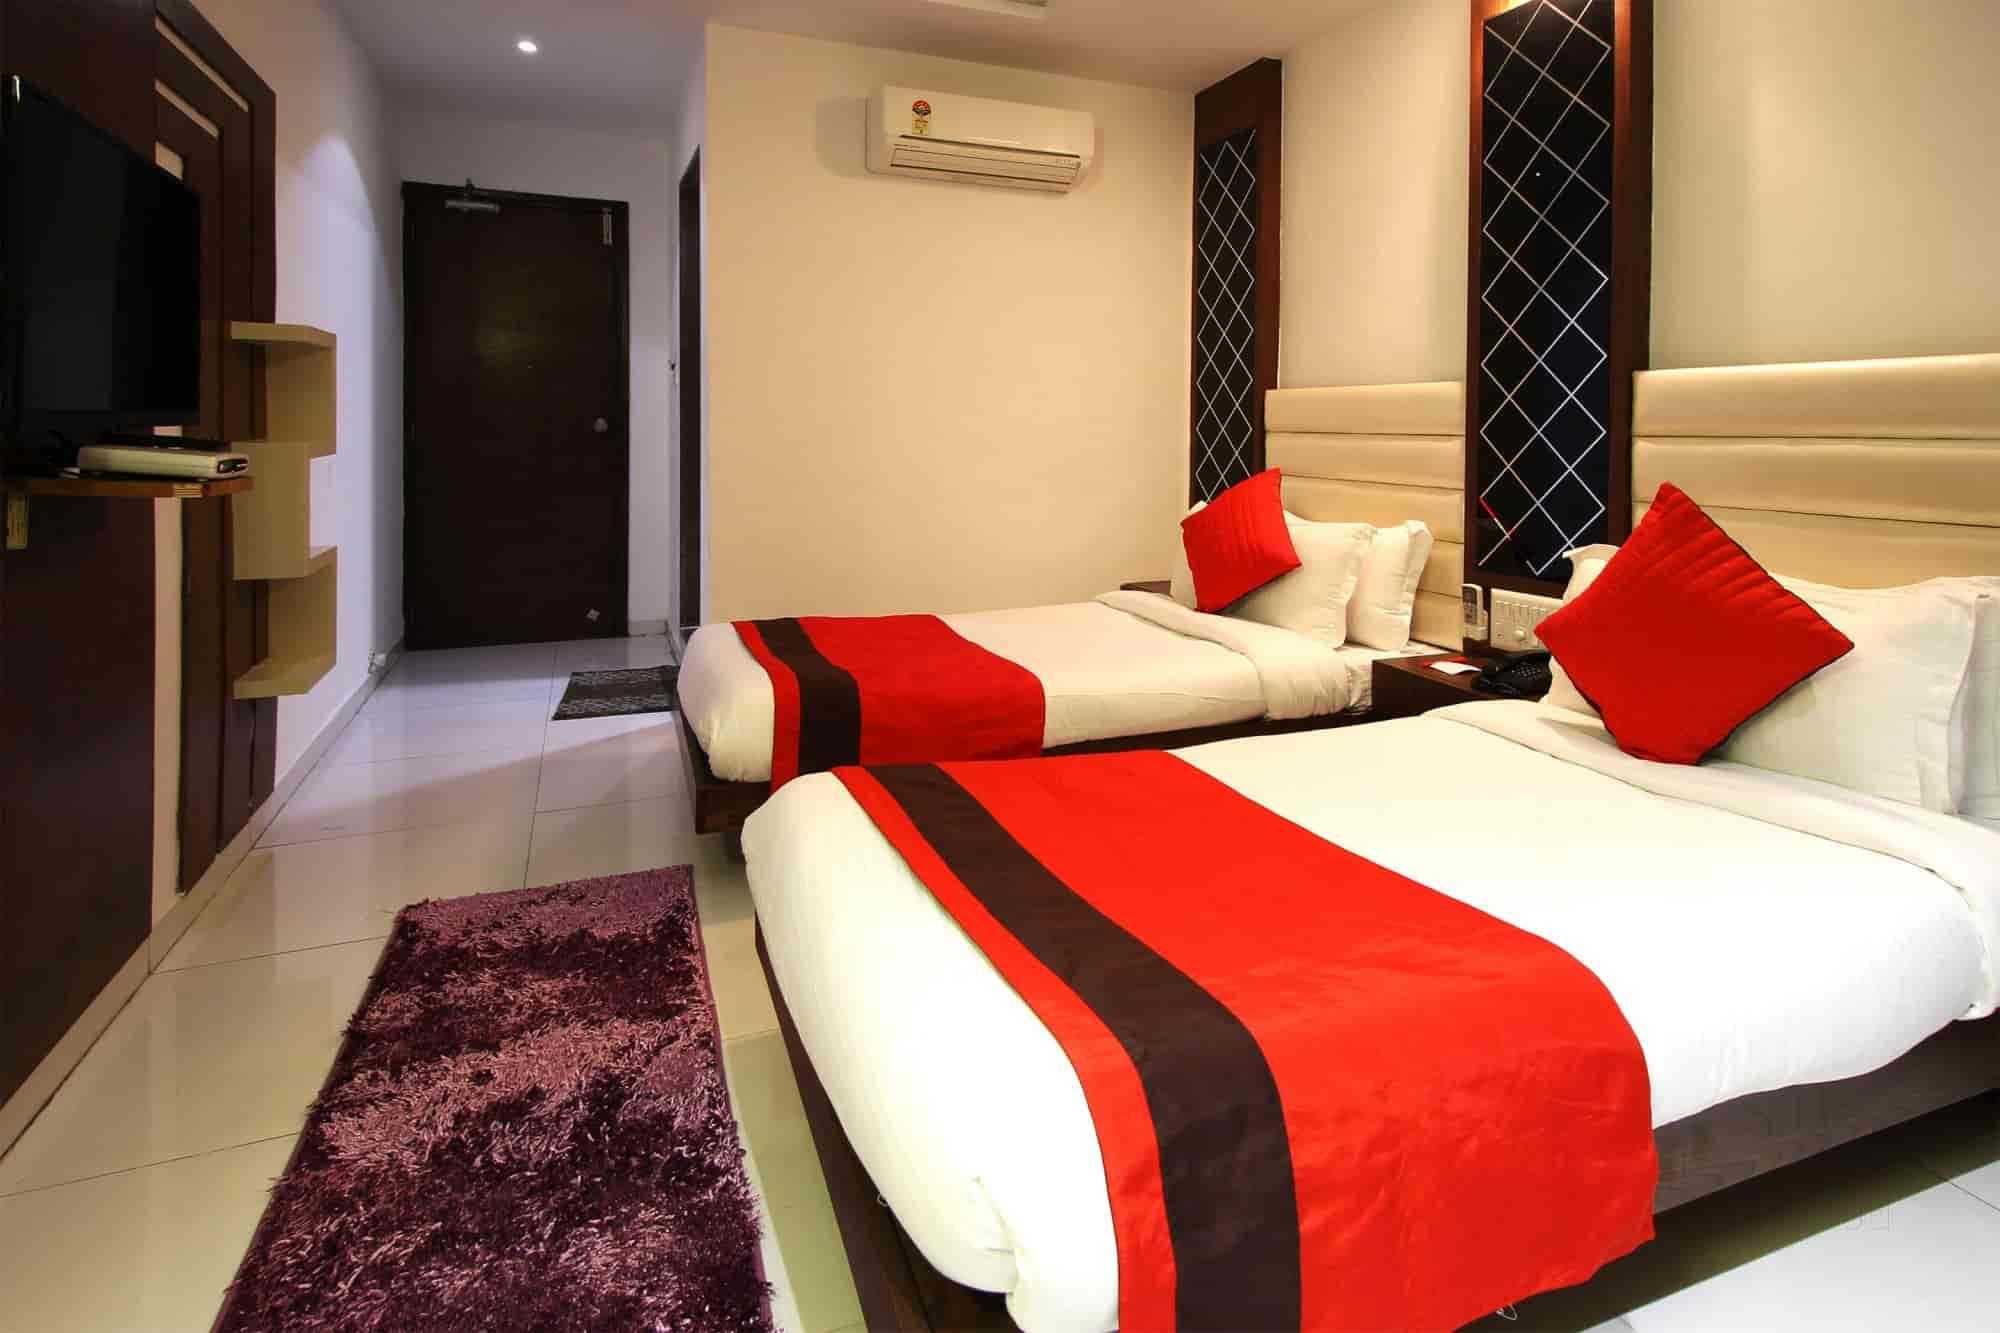 OYO Rooms 076 Photos, Navrangpura, Ahmedabad- Pictures & Images ...